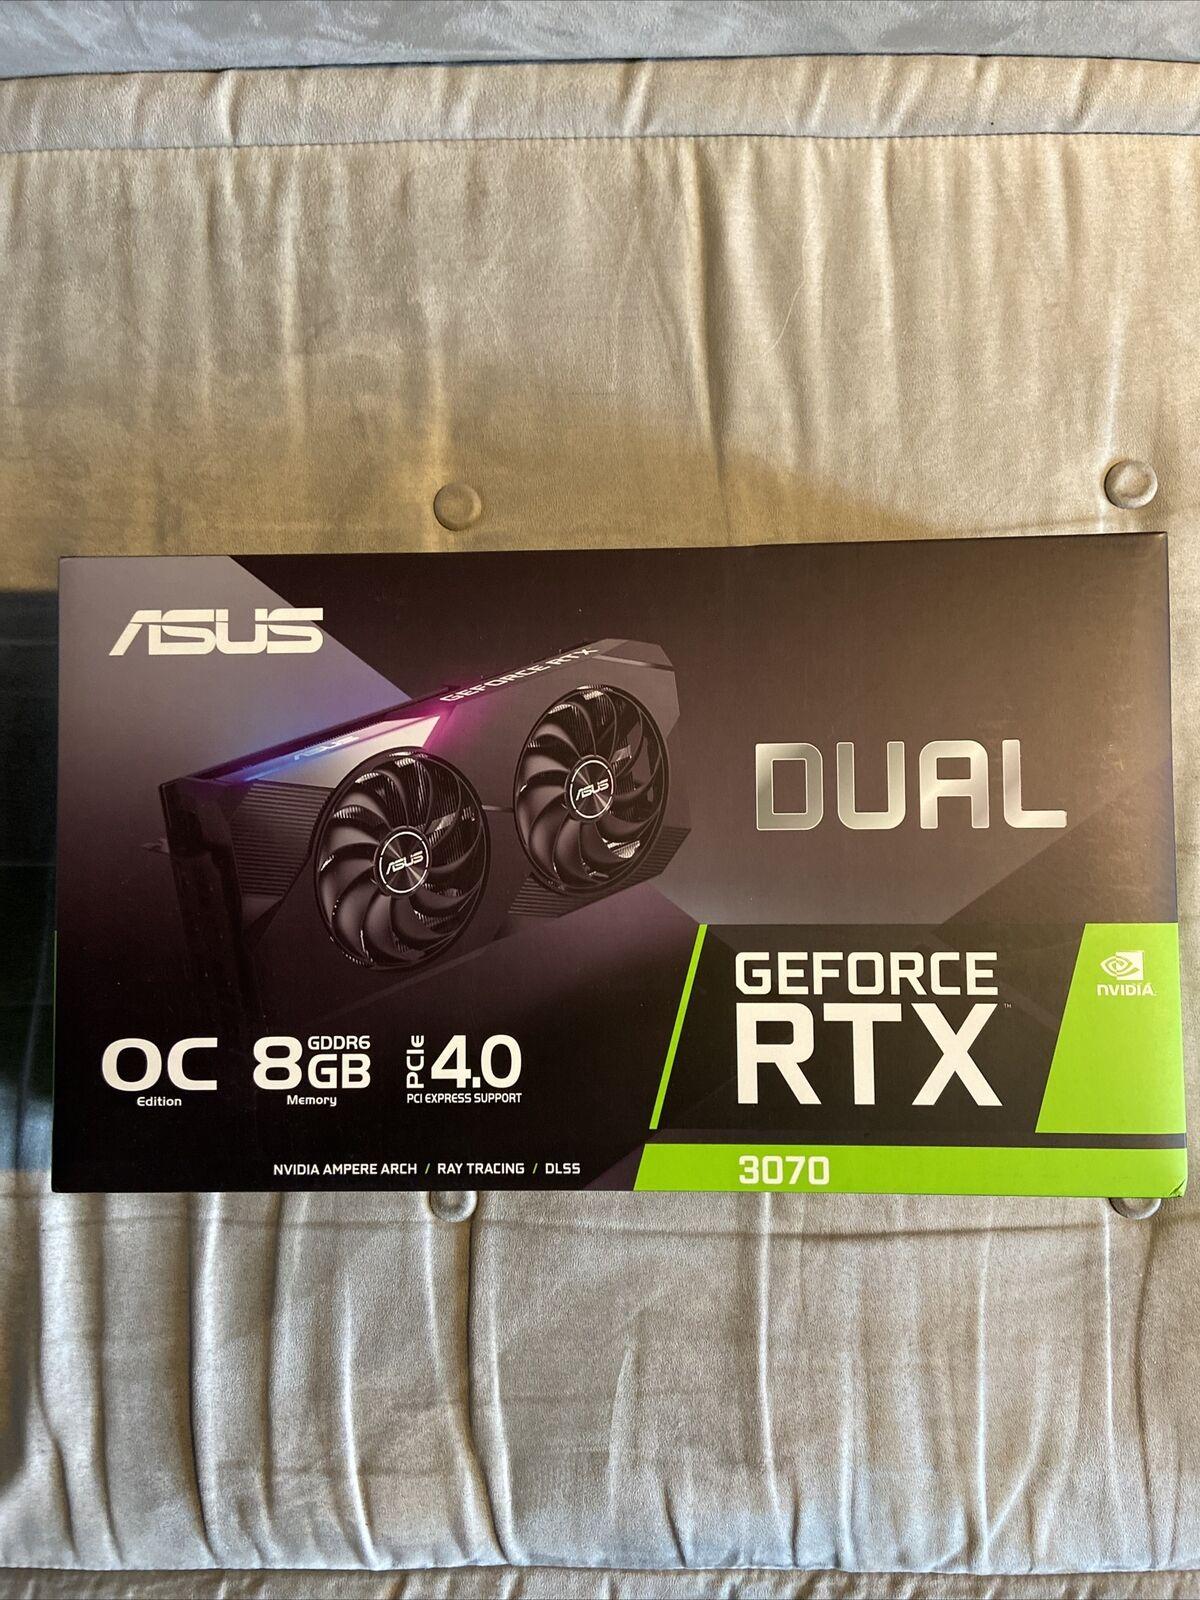 ASUS DUAL GeForce RTX 3070 OC 8GB GDDR6 Graphics Card